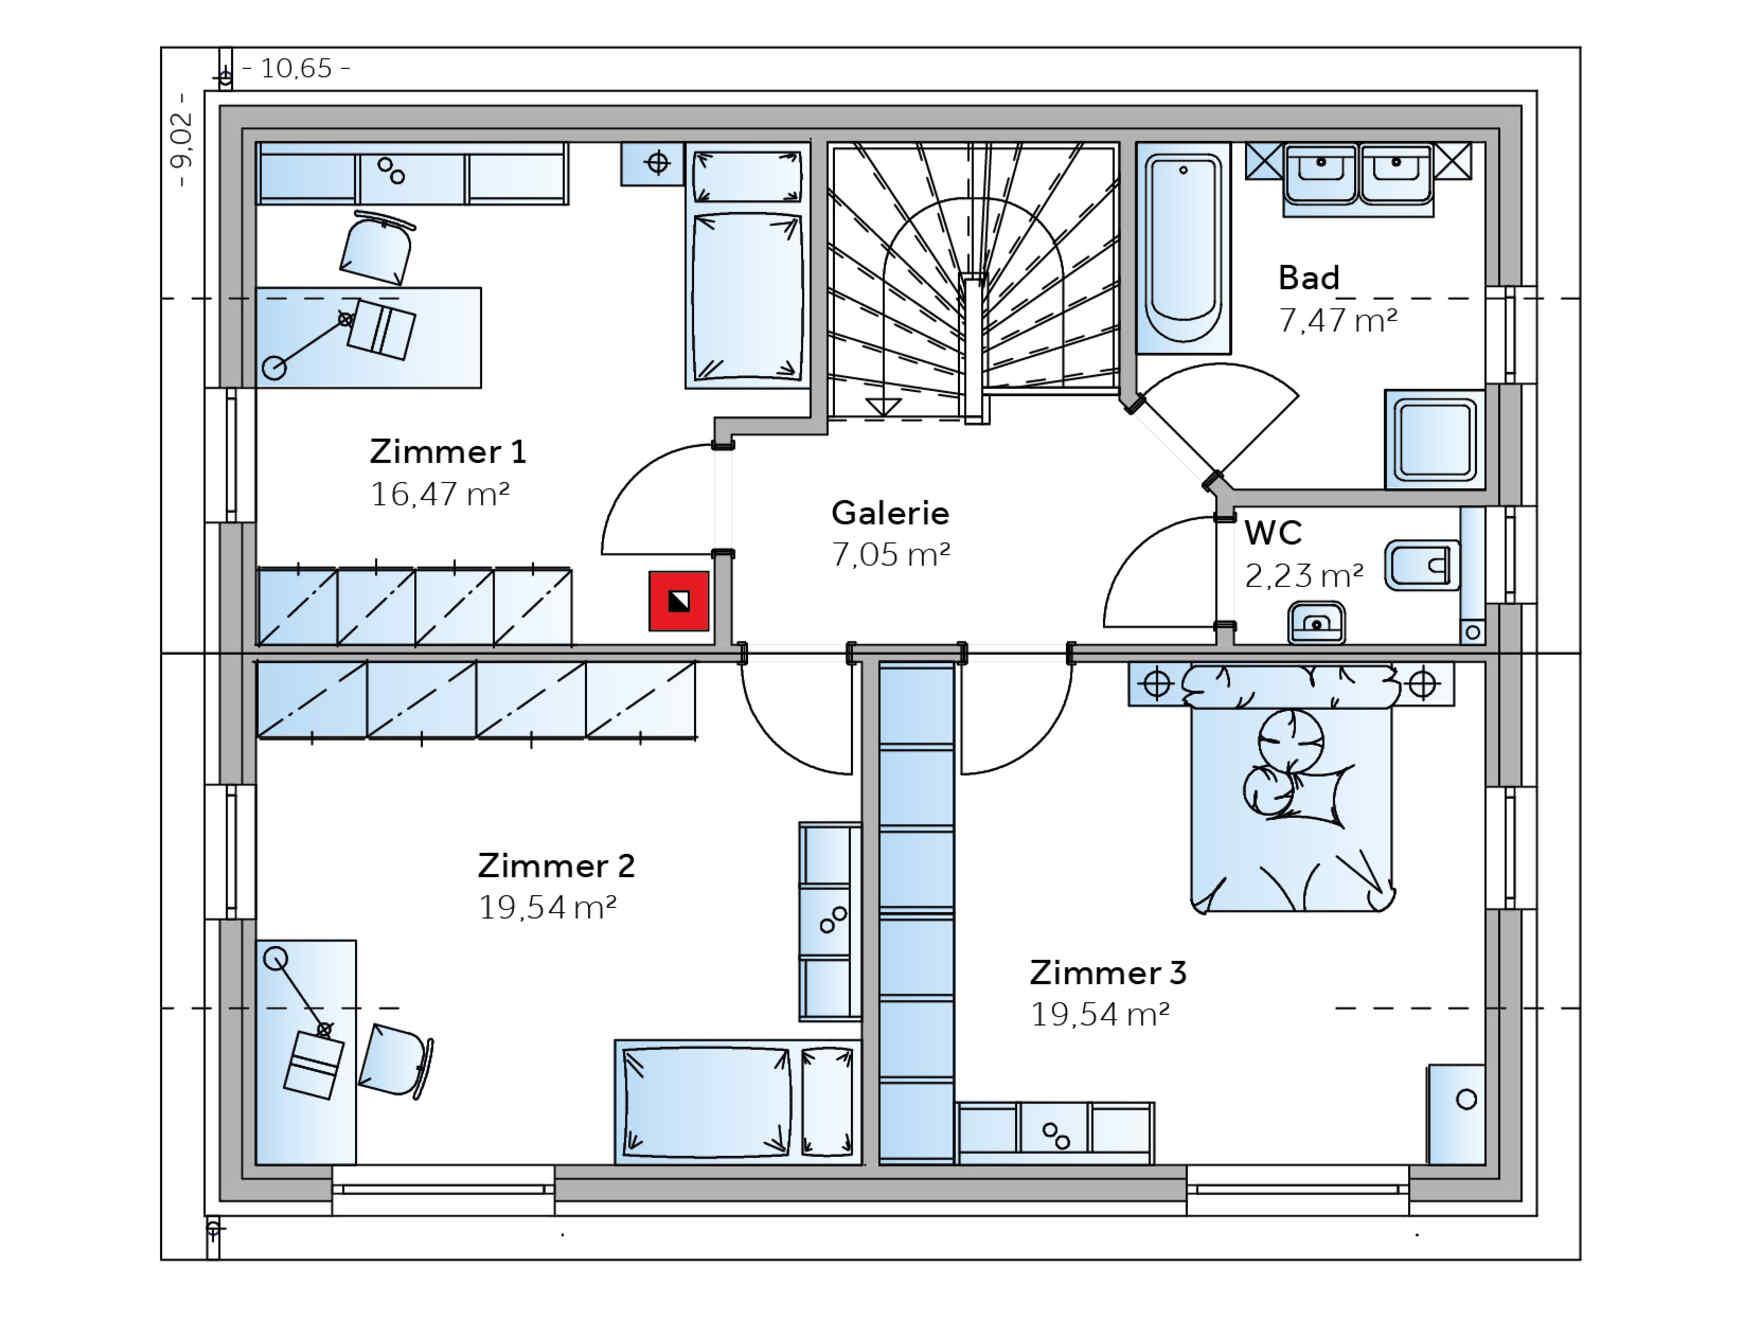 Favoloso casa prefabbricata a basso consume energetico Novum | VARIO-HAUS  QZ48